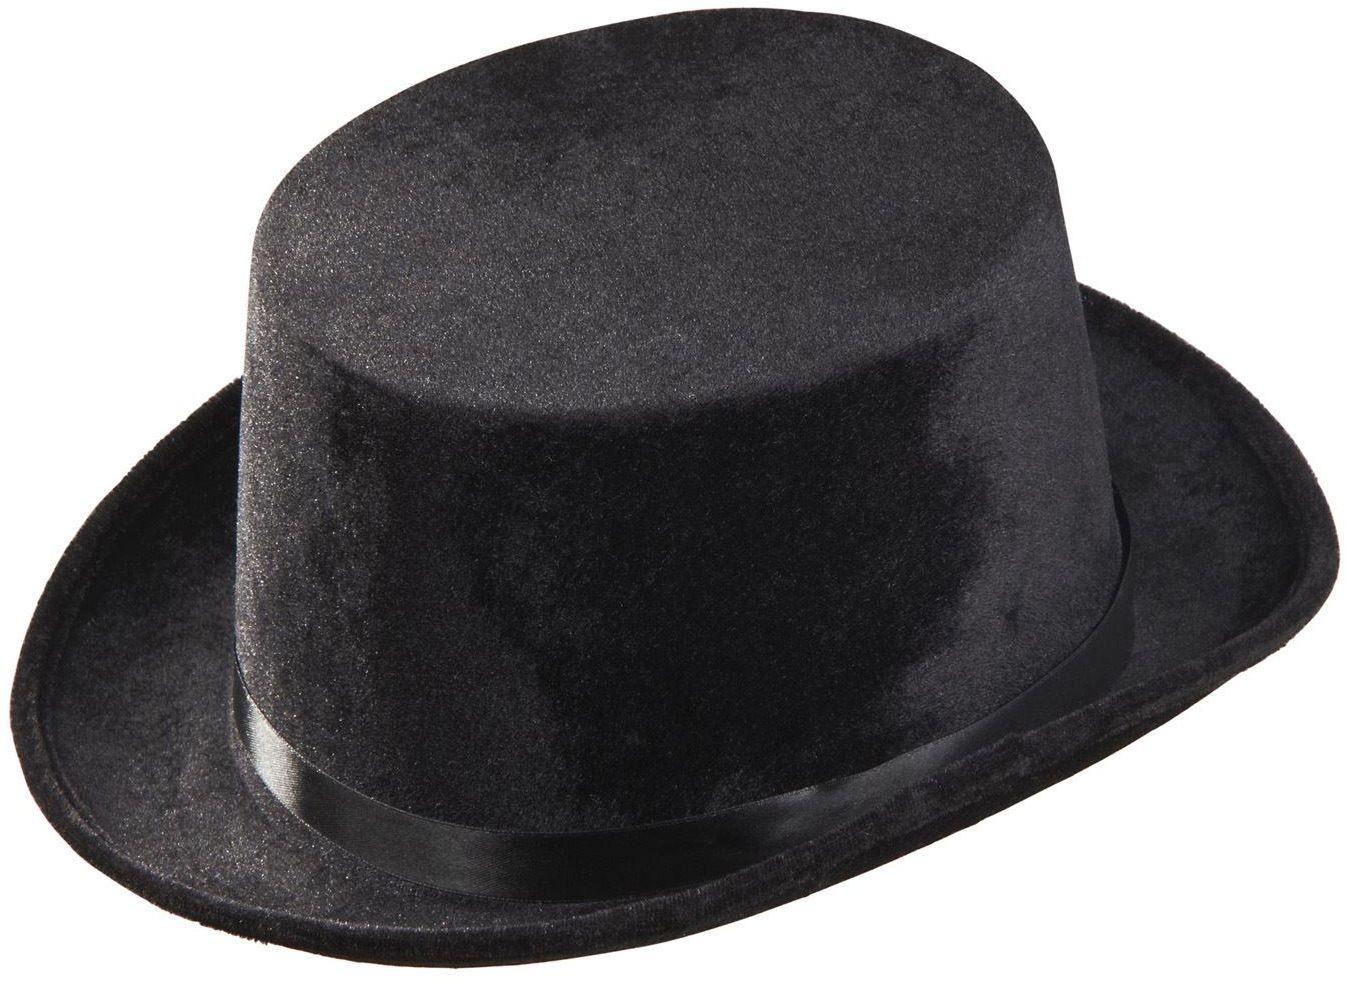 Fluwelen hoge hoed zwart